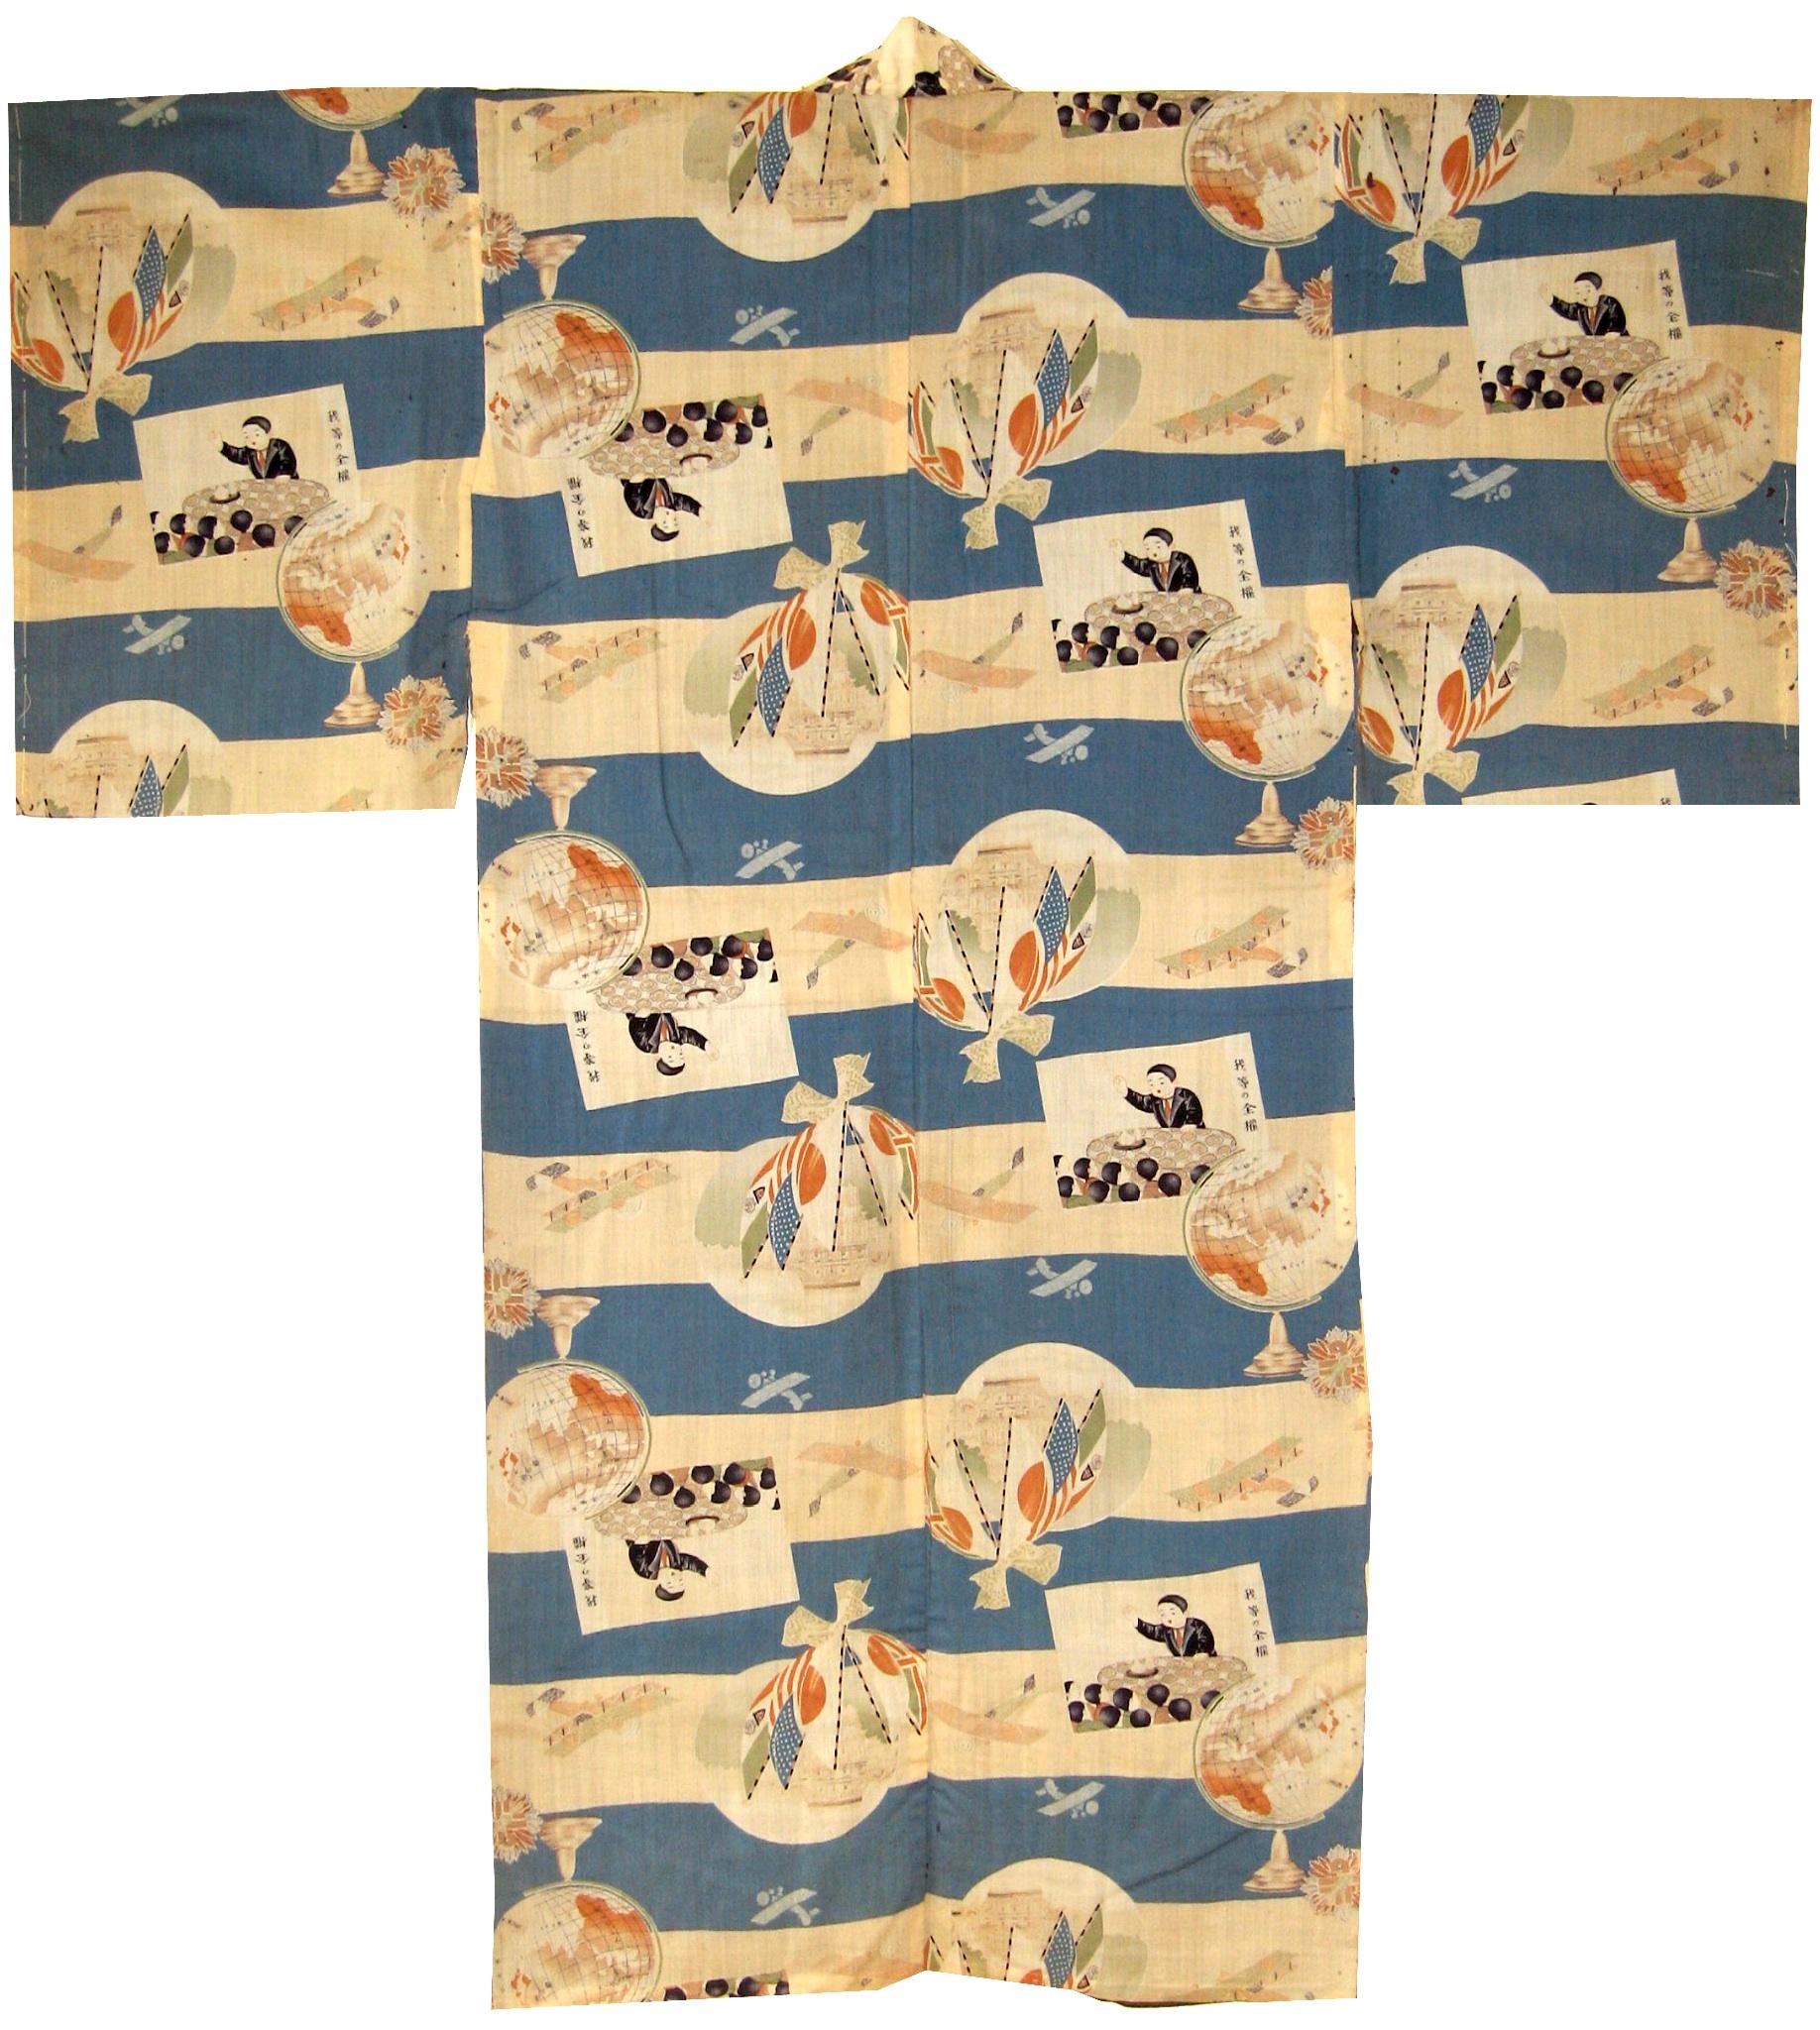 League of Nations, Man's Nagajuban, c. 1933, wool, 51.5h x 48.75w in.